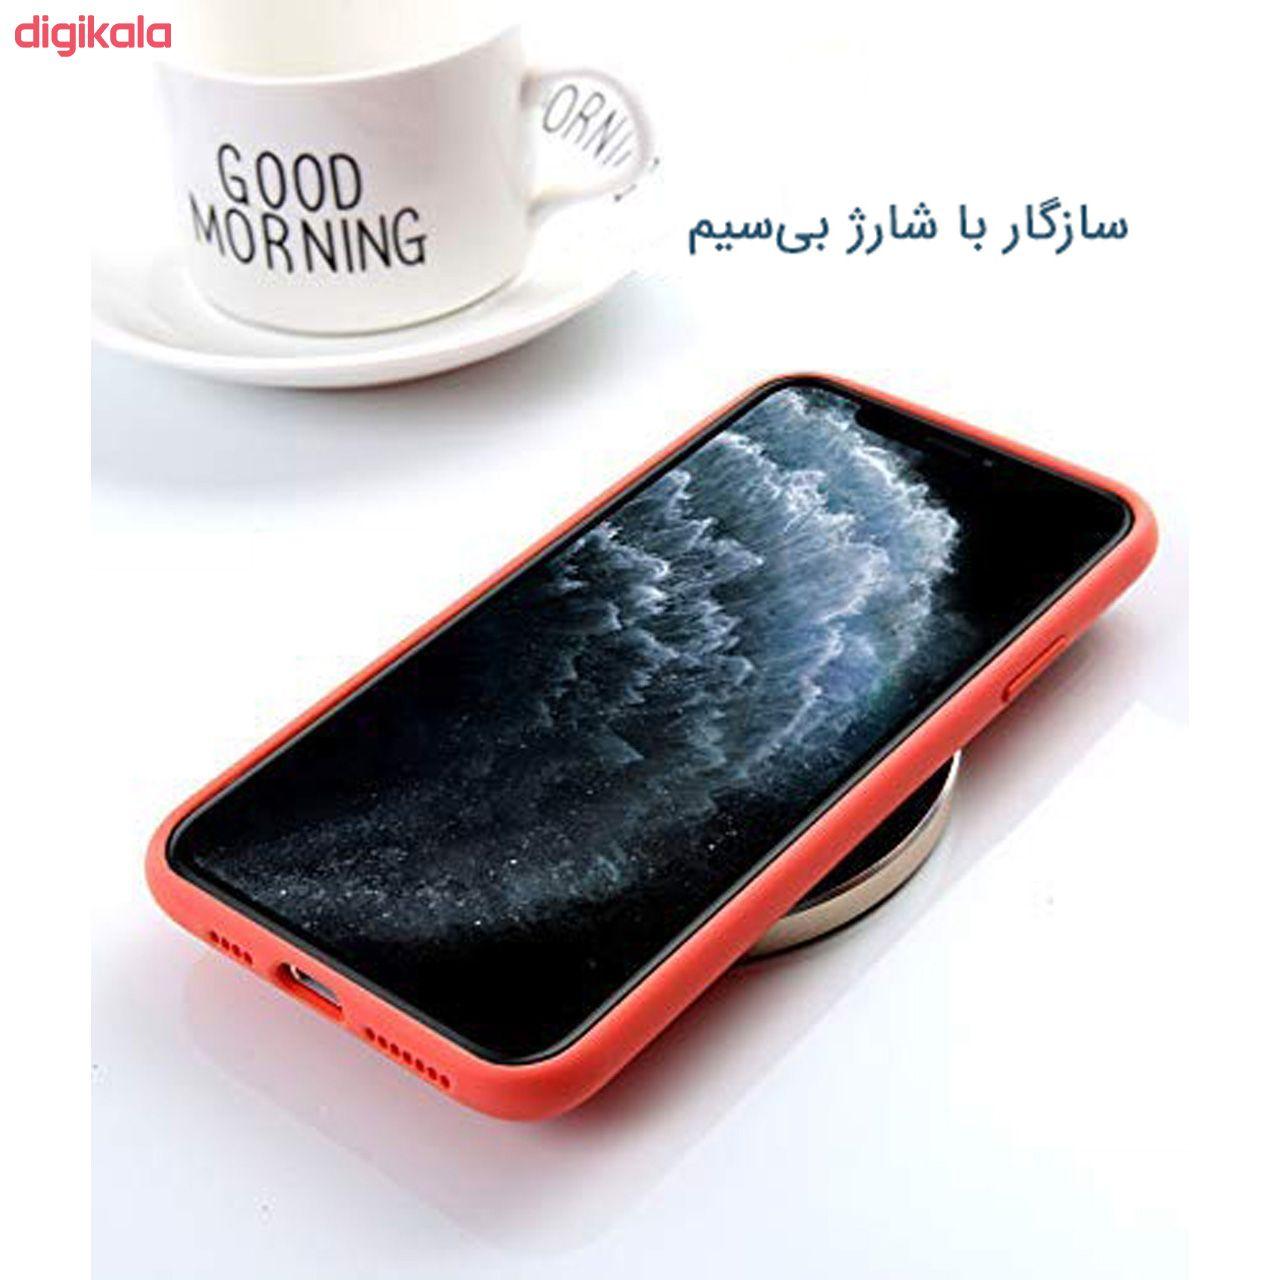 کاور وی کیس مدل Si01 مناسب برای گوشی موبایل اپل iPhone 11 Pro Max main 1 7